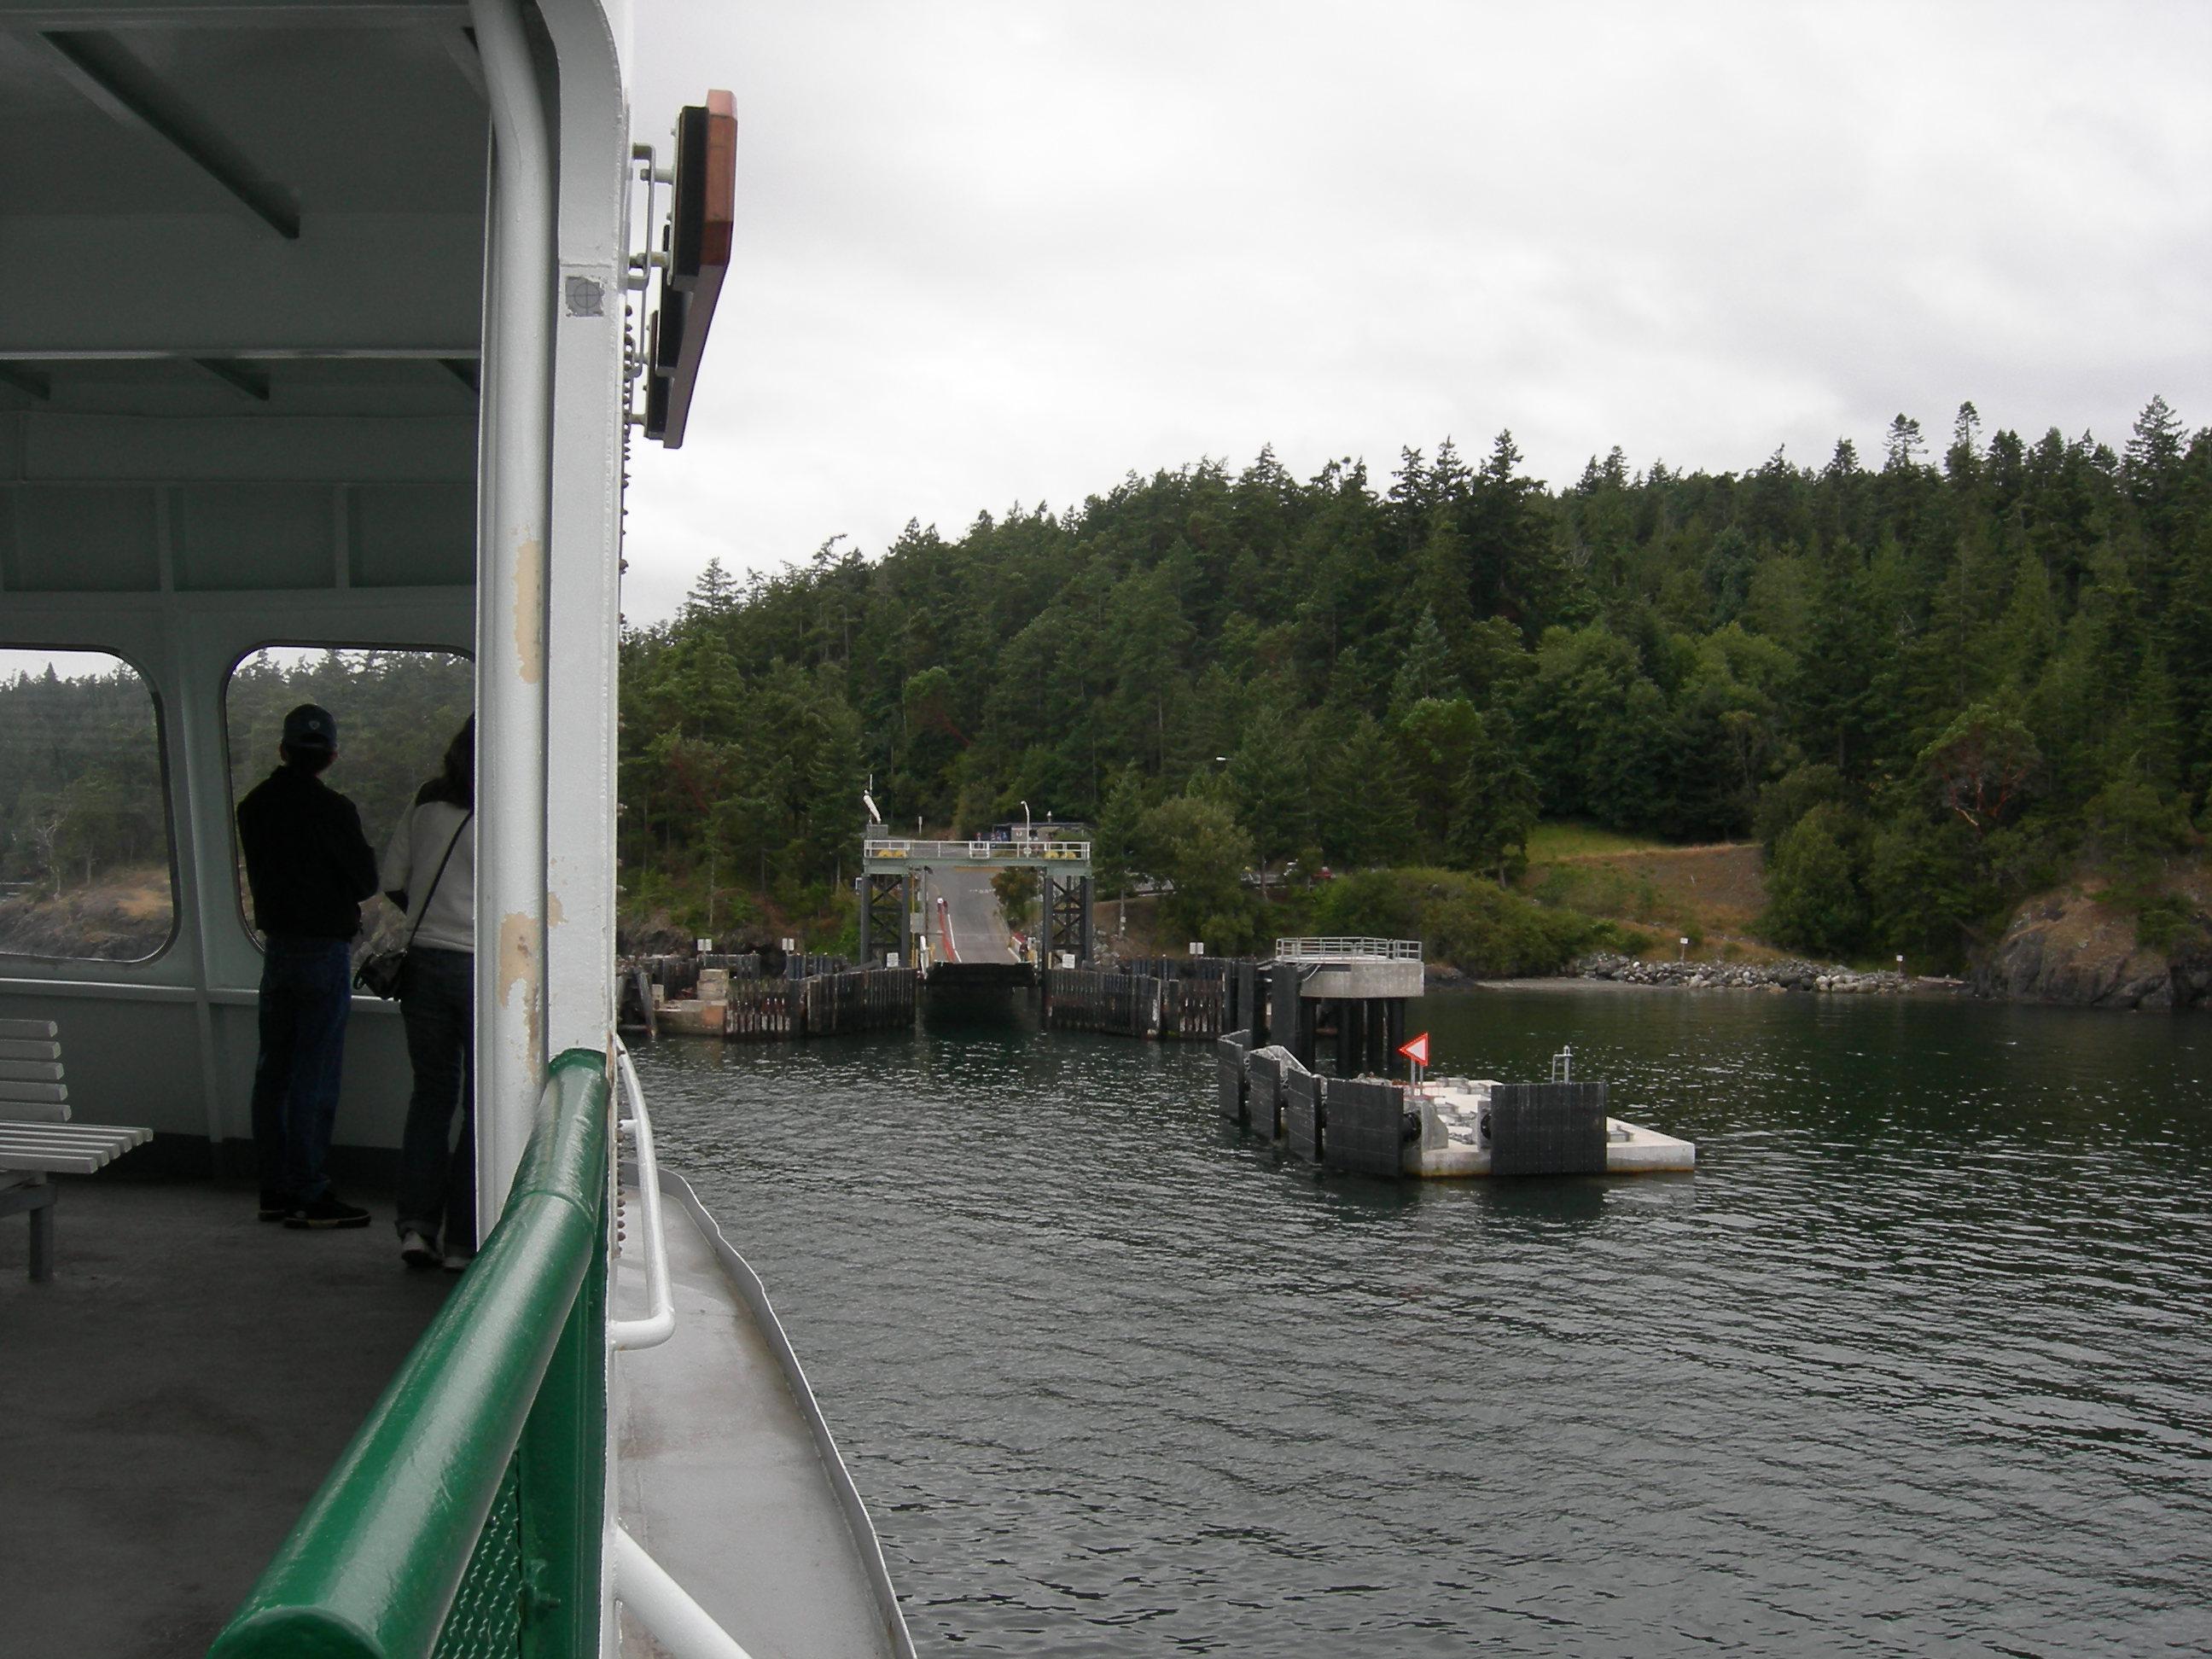 Lopez Island Ferry Wait Times